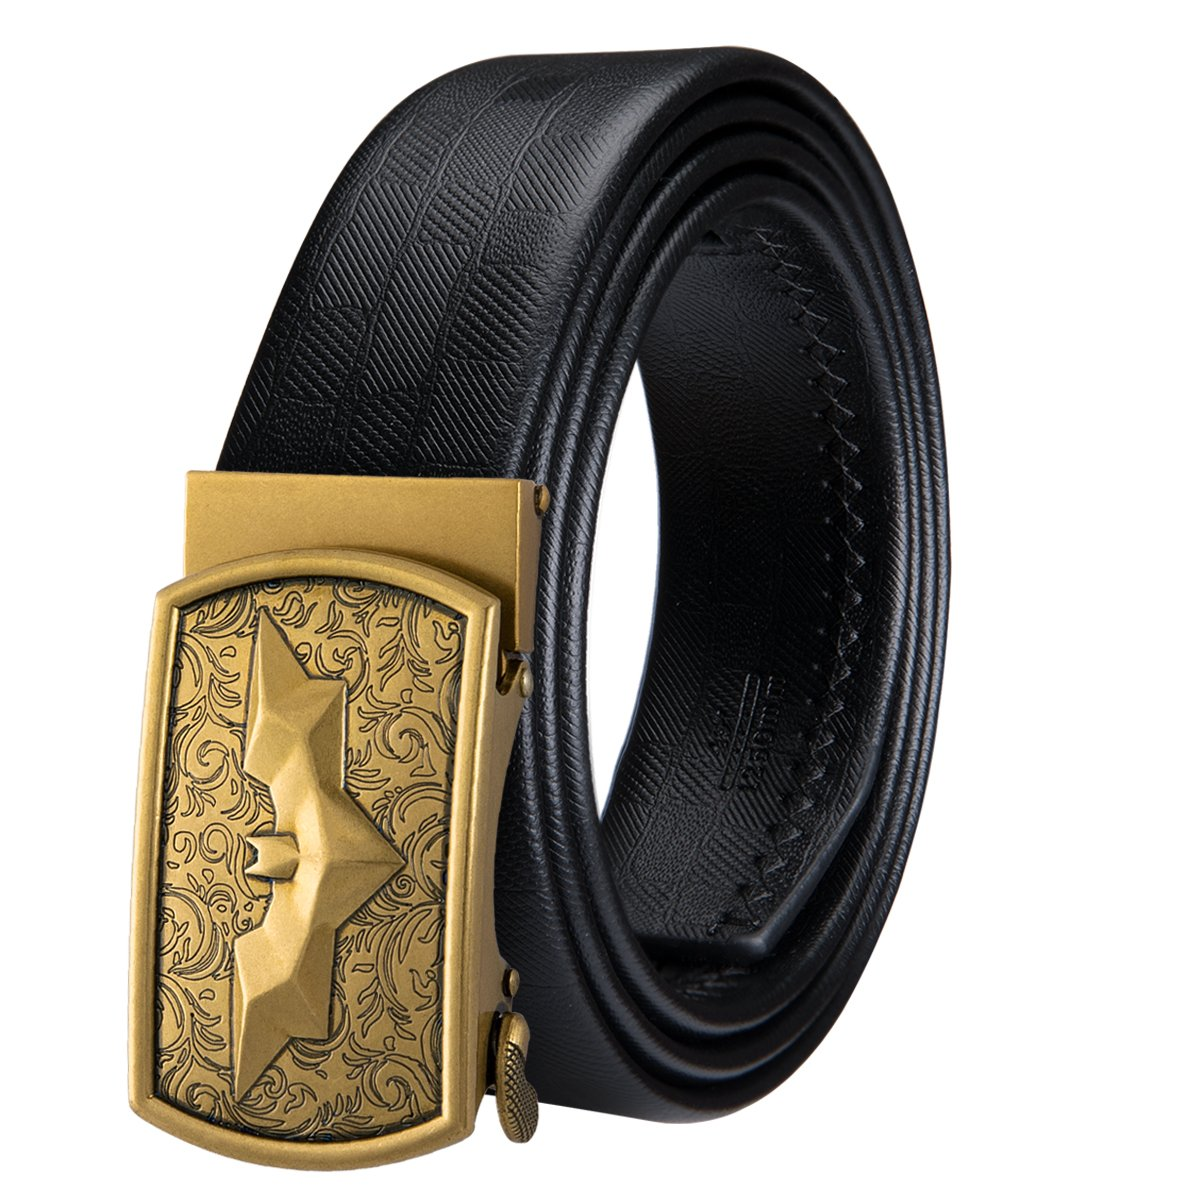 Dubulle Mens Italian Genuine Leather Belt with Removable Buckle Adjustable Automatic Buckle Belt Black Ratchet Belt for Men (DK-1004, waist size 33'' to 41'', belt 49''(125cm))